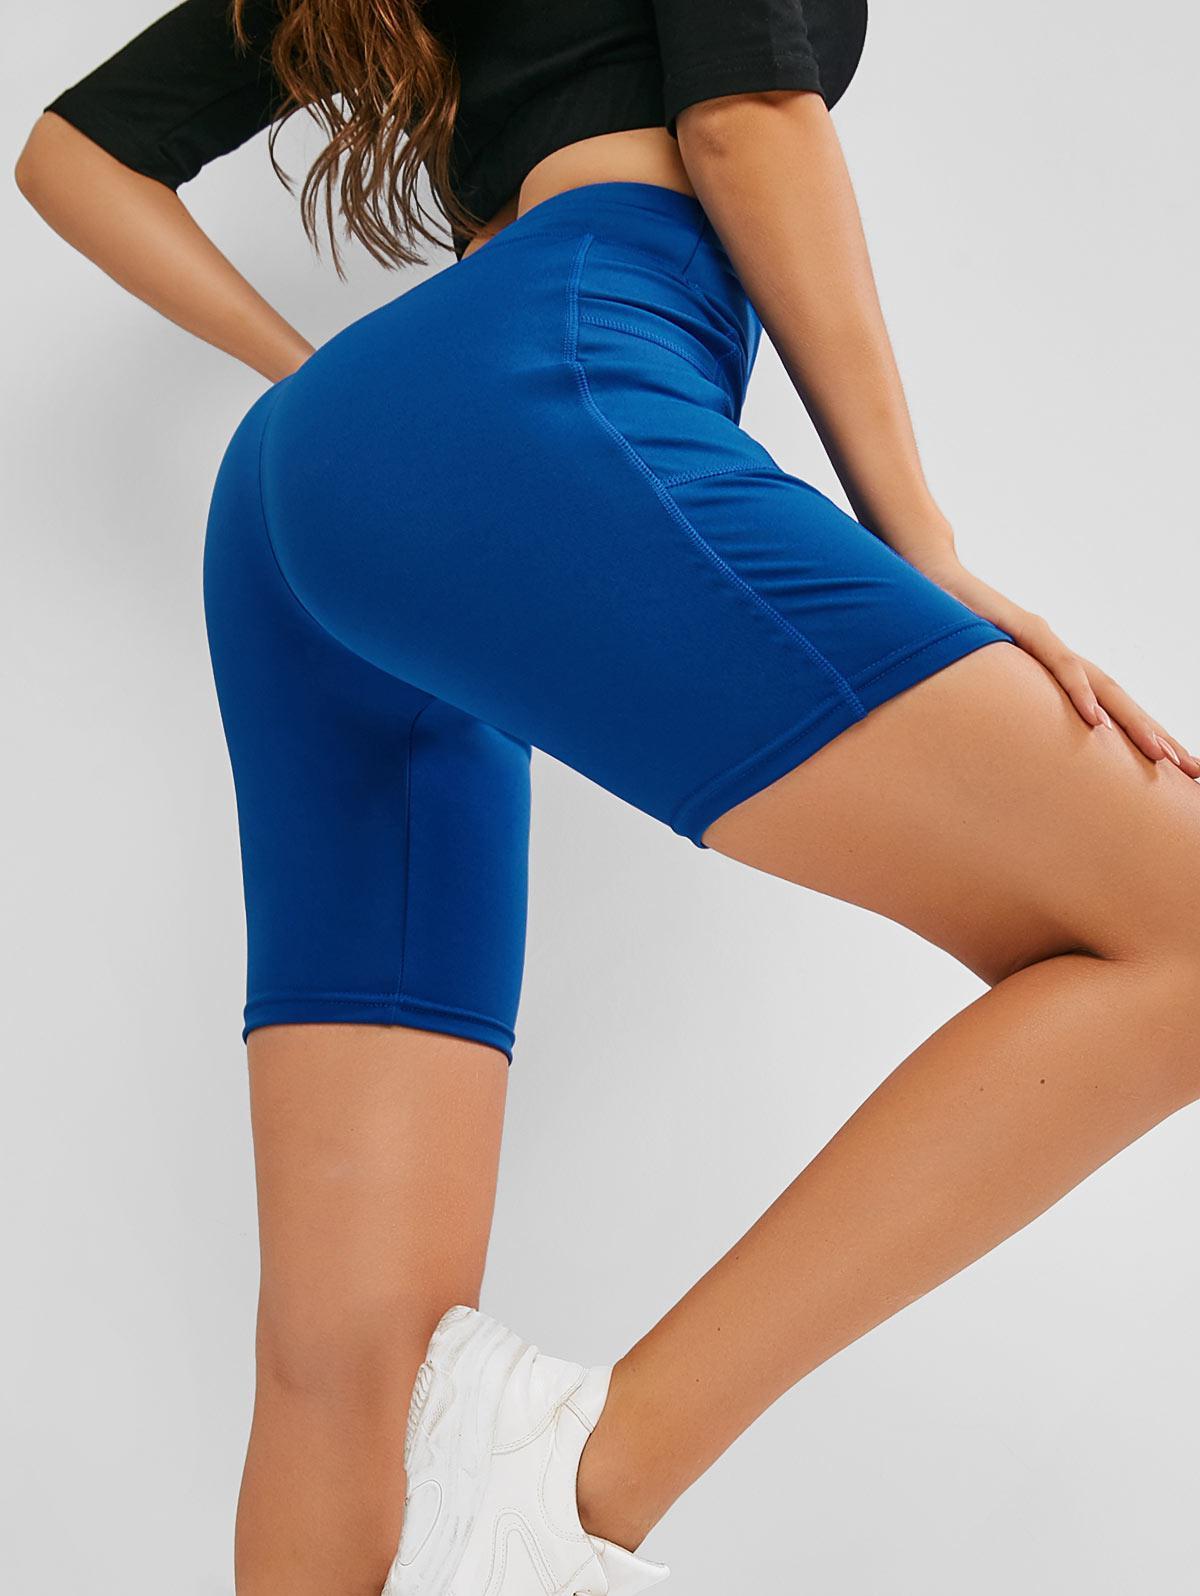 High Waisted Yoga Shorts